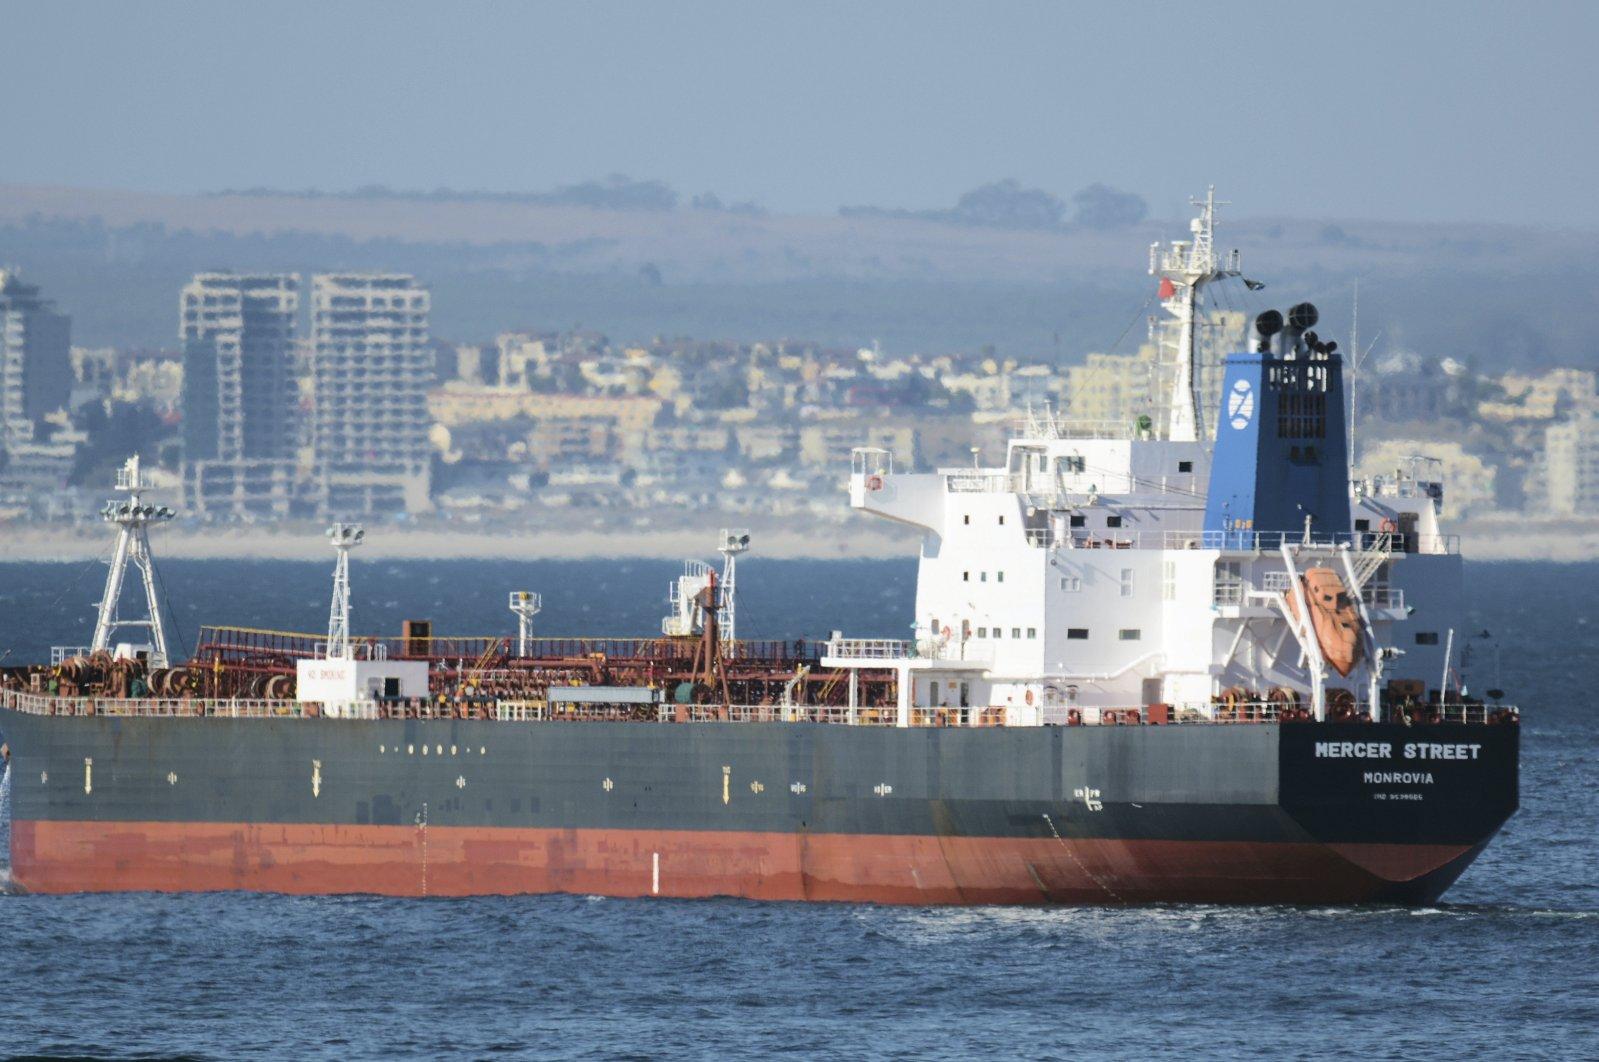 The Liberian-flagged oil tanker Mercer Street off Cape Town, South Africa, Jan. 2, 2016. (AP Photo)